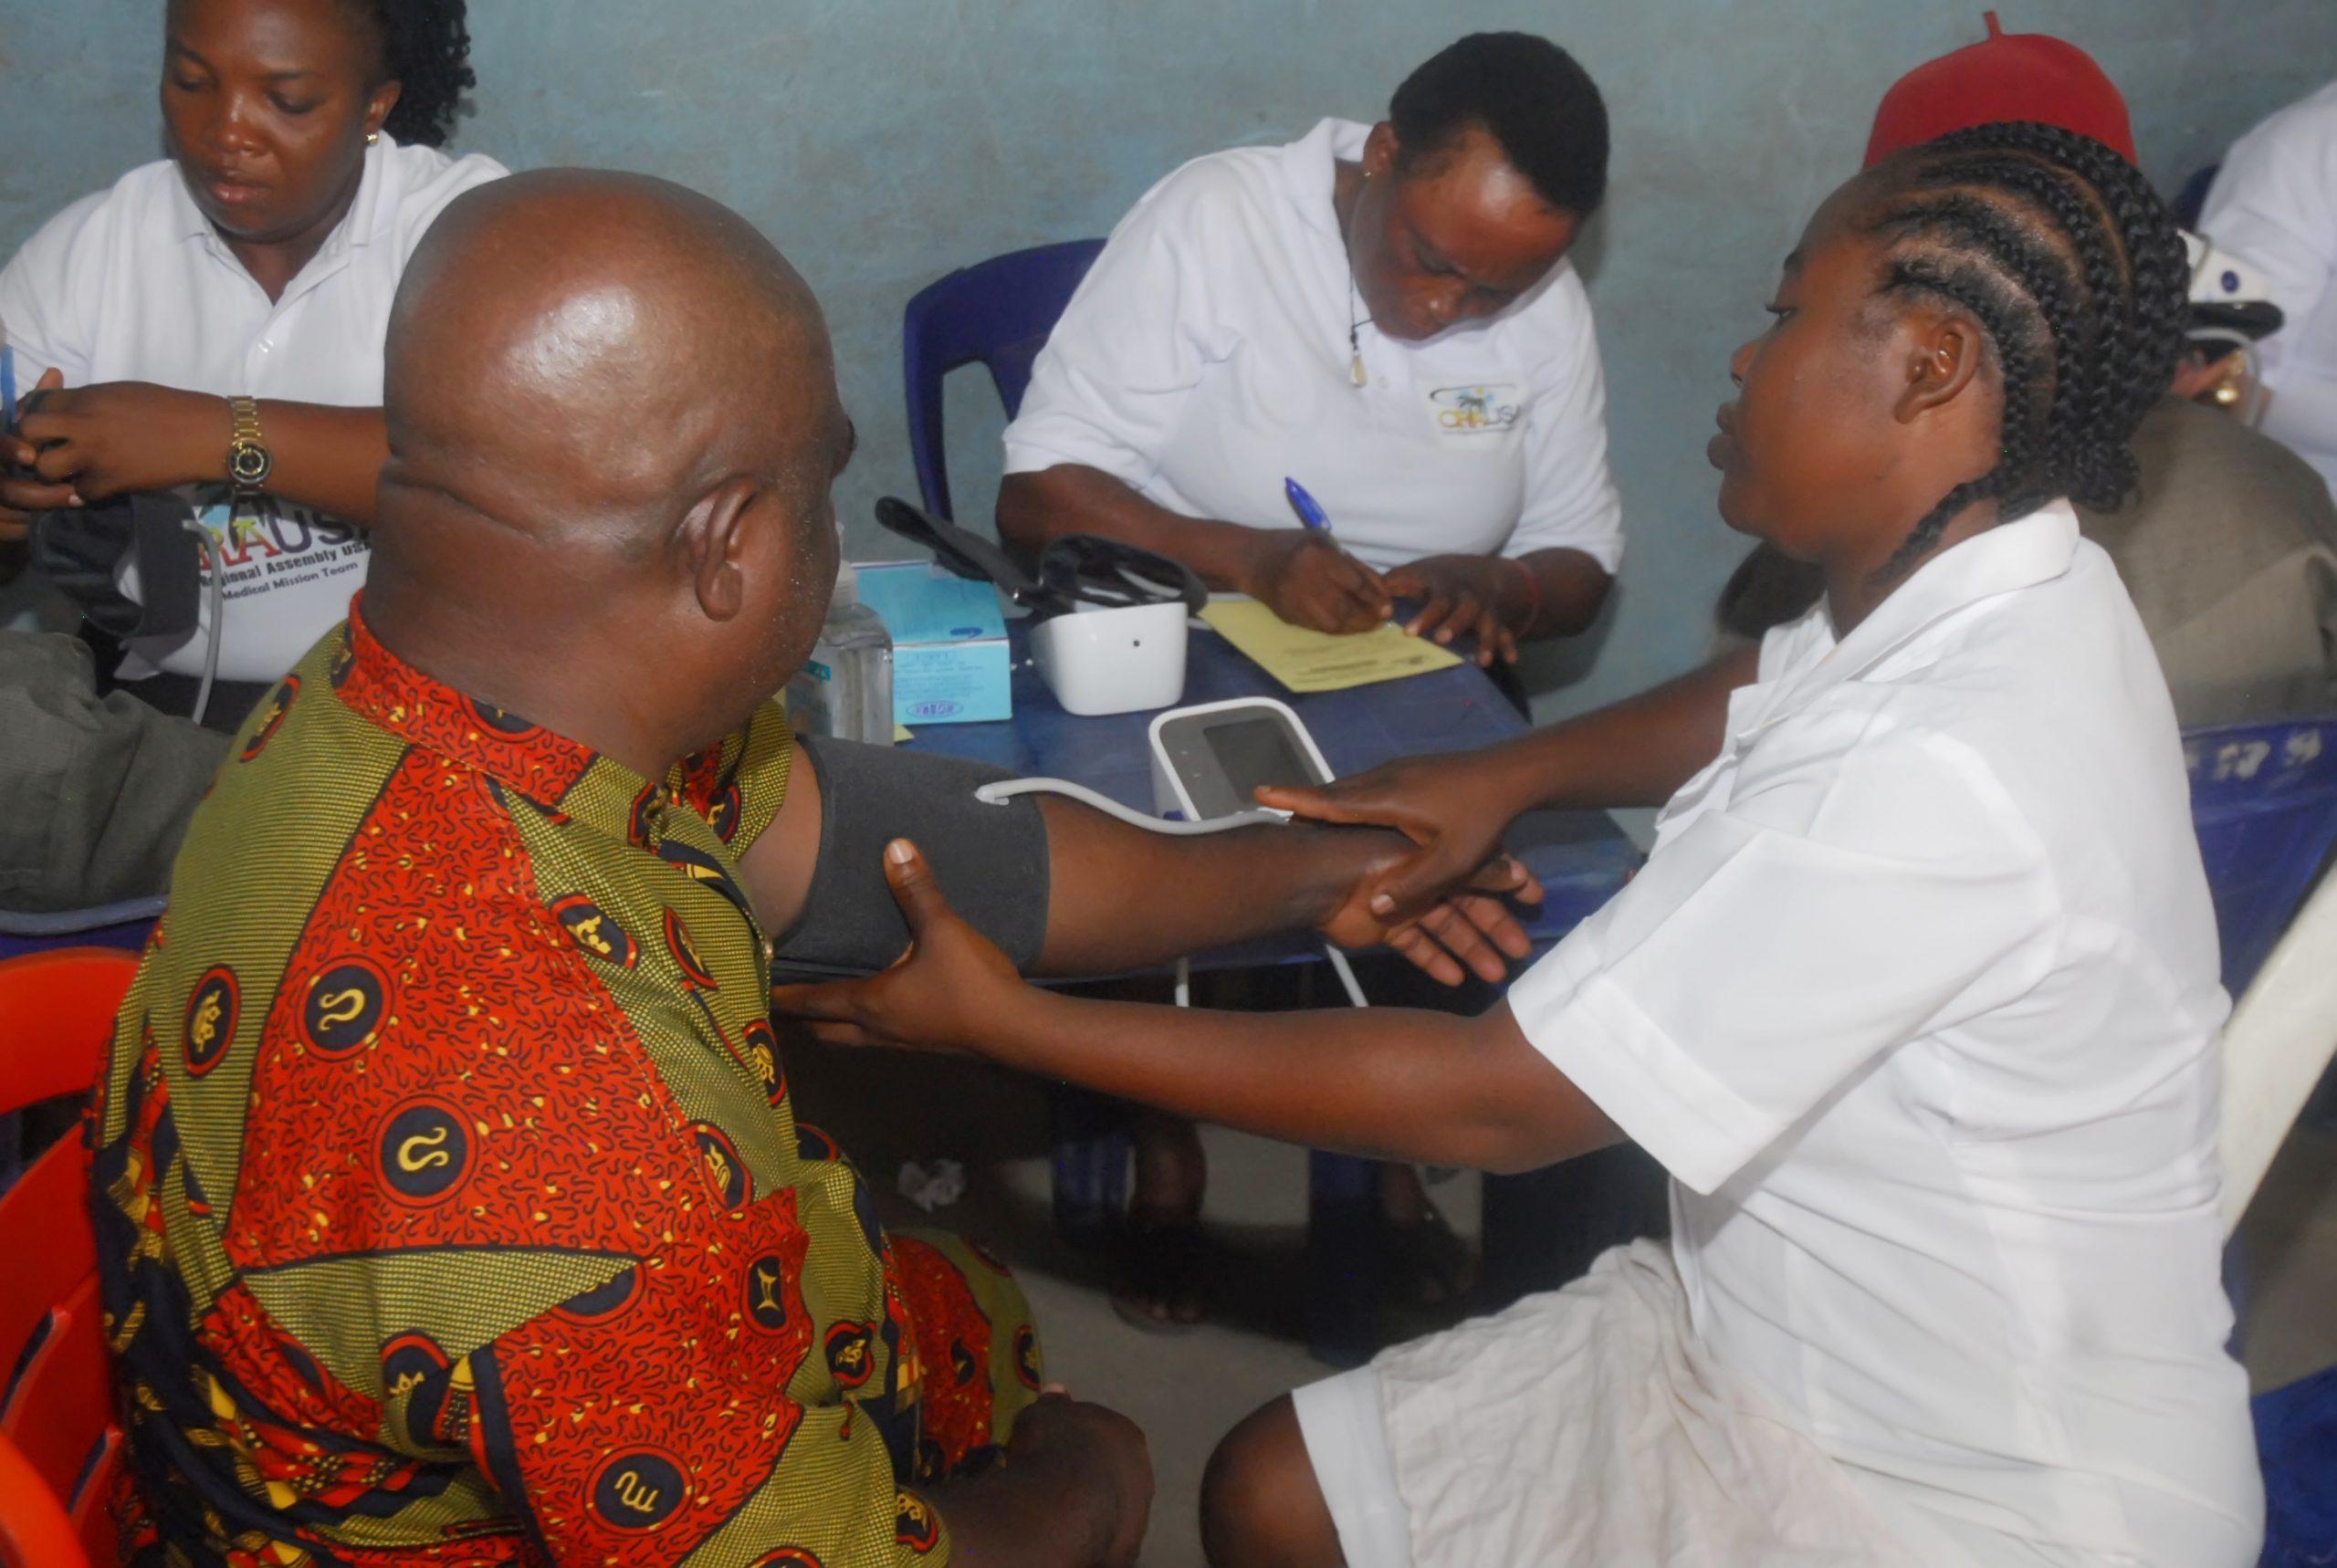 ORAUSA Medical Mission